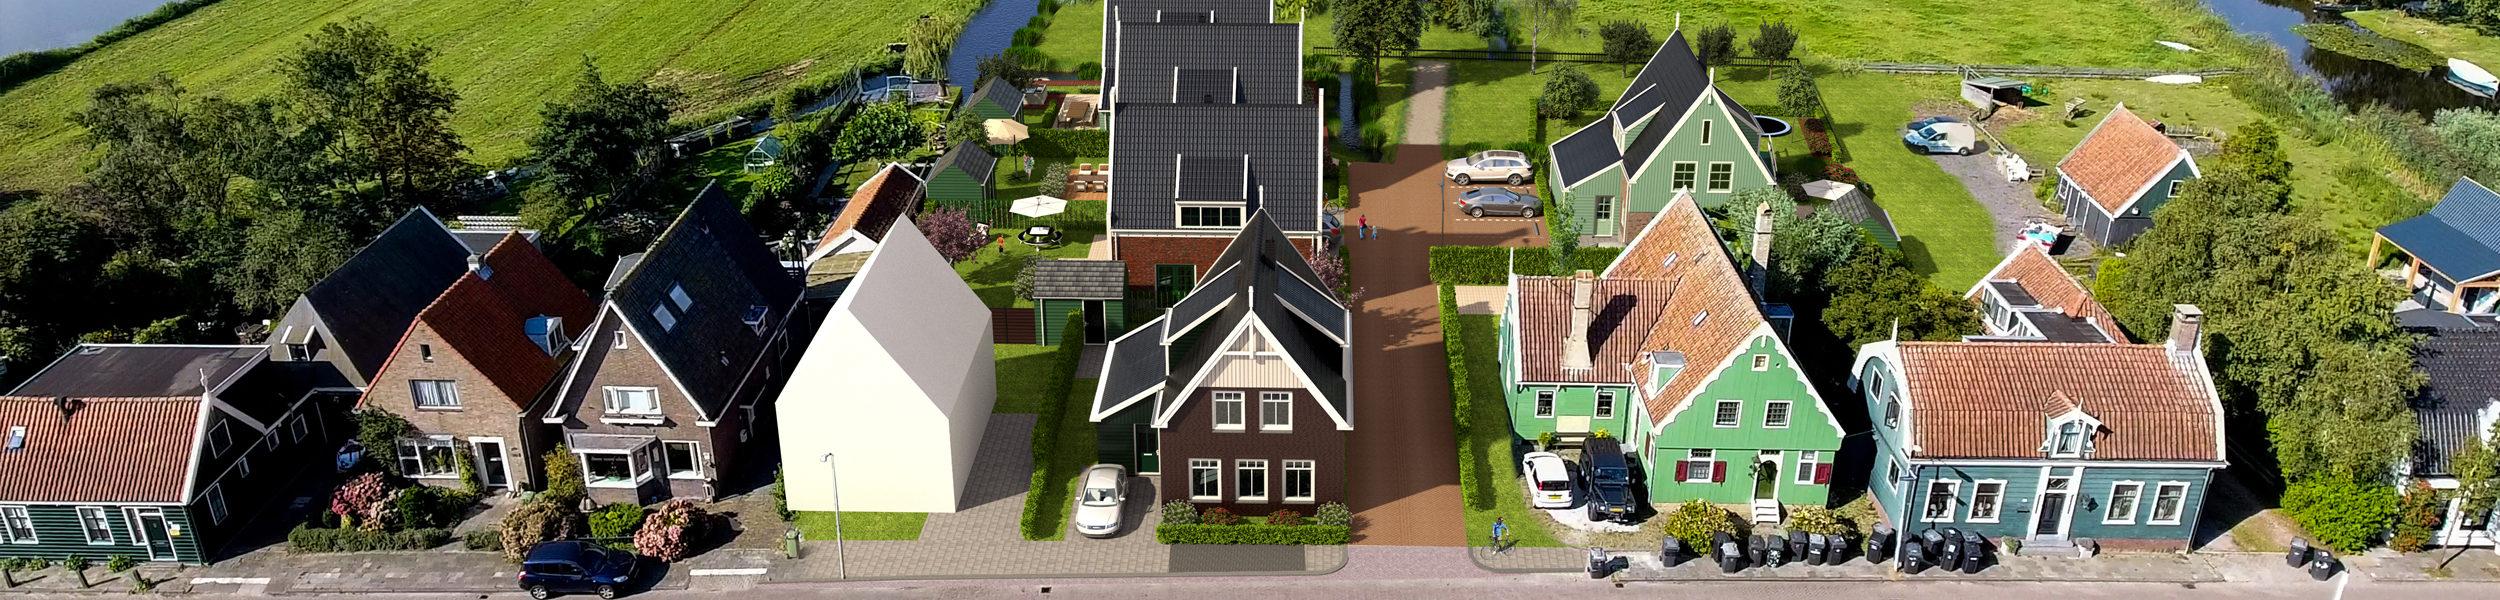 Eydenberghof Westzaan slider 2